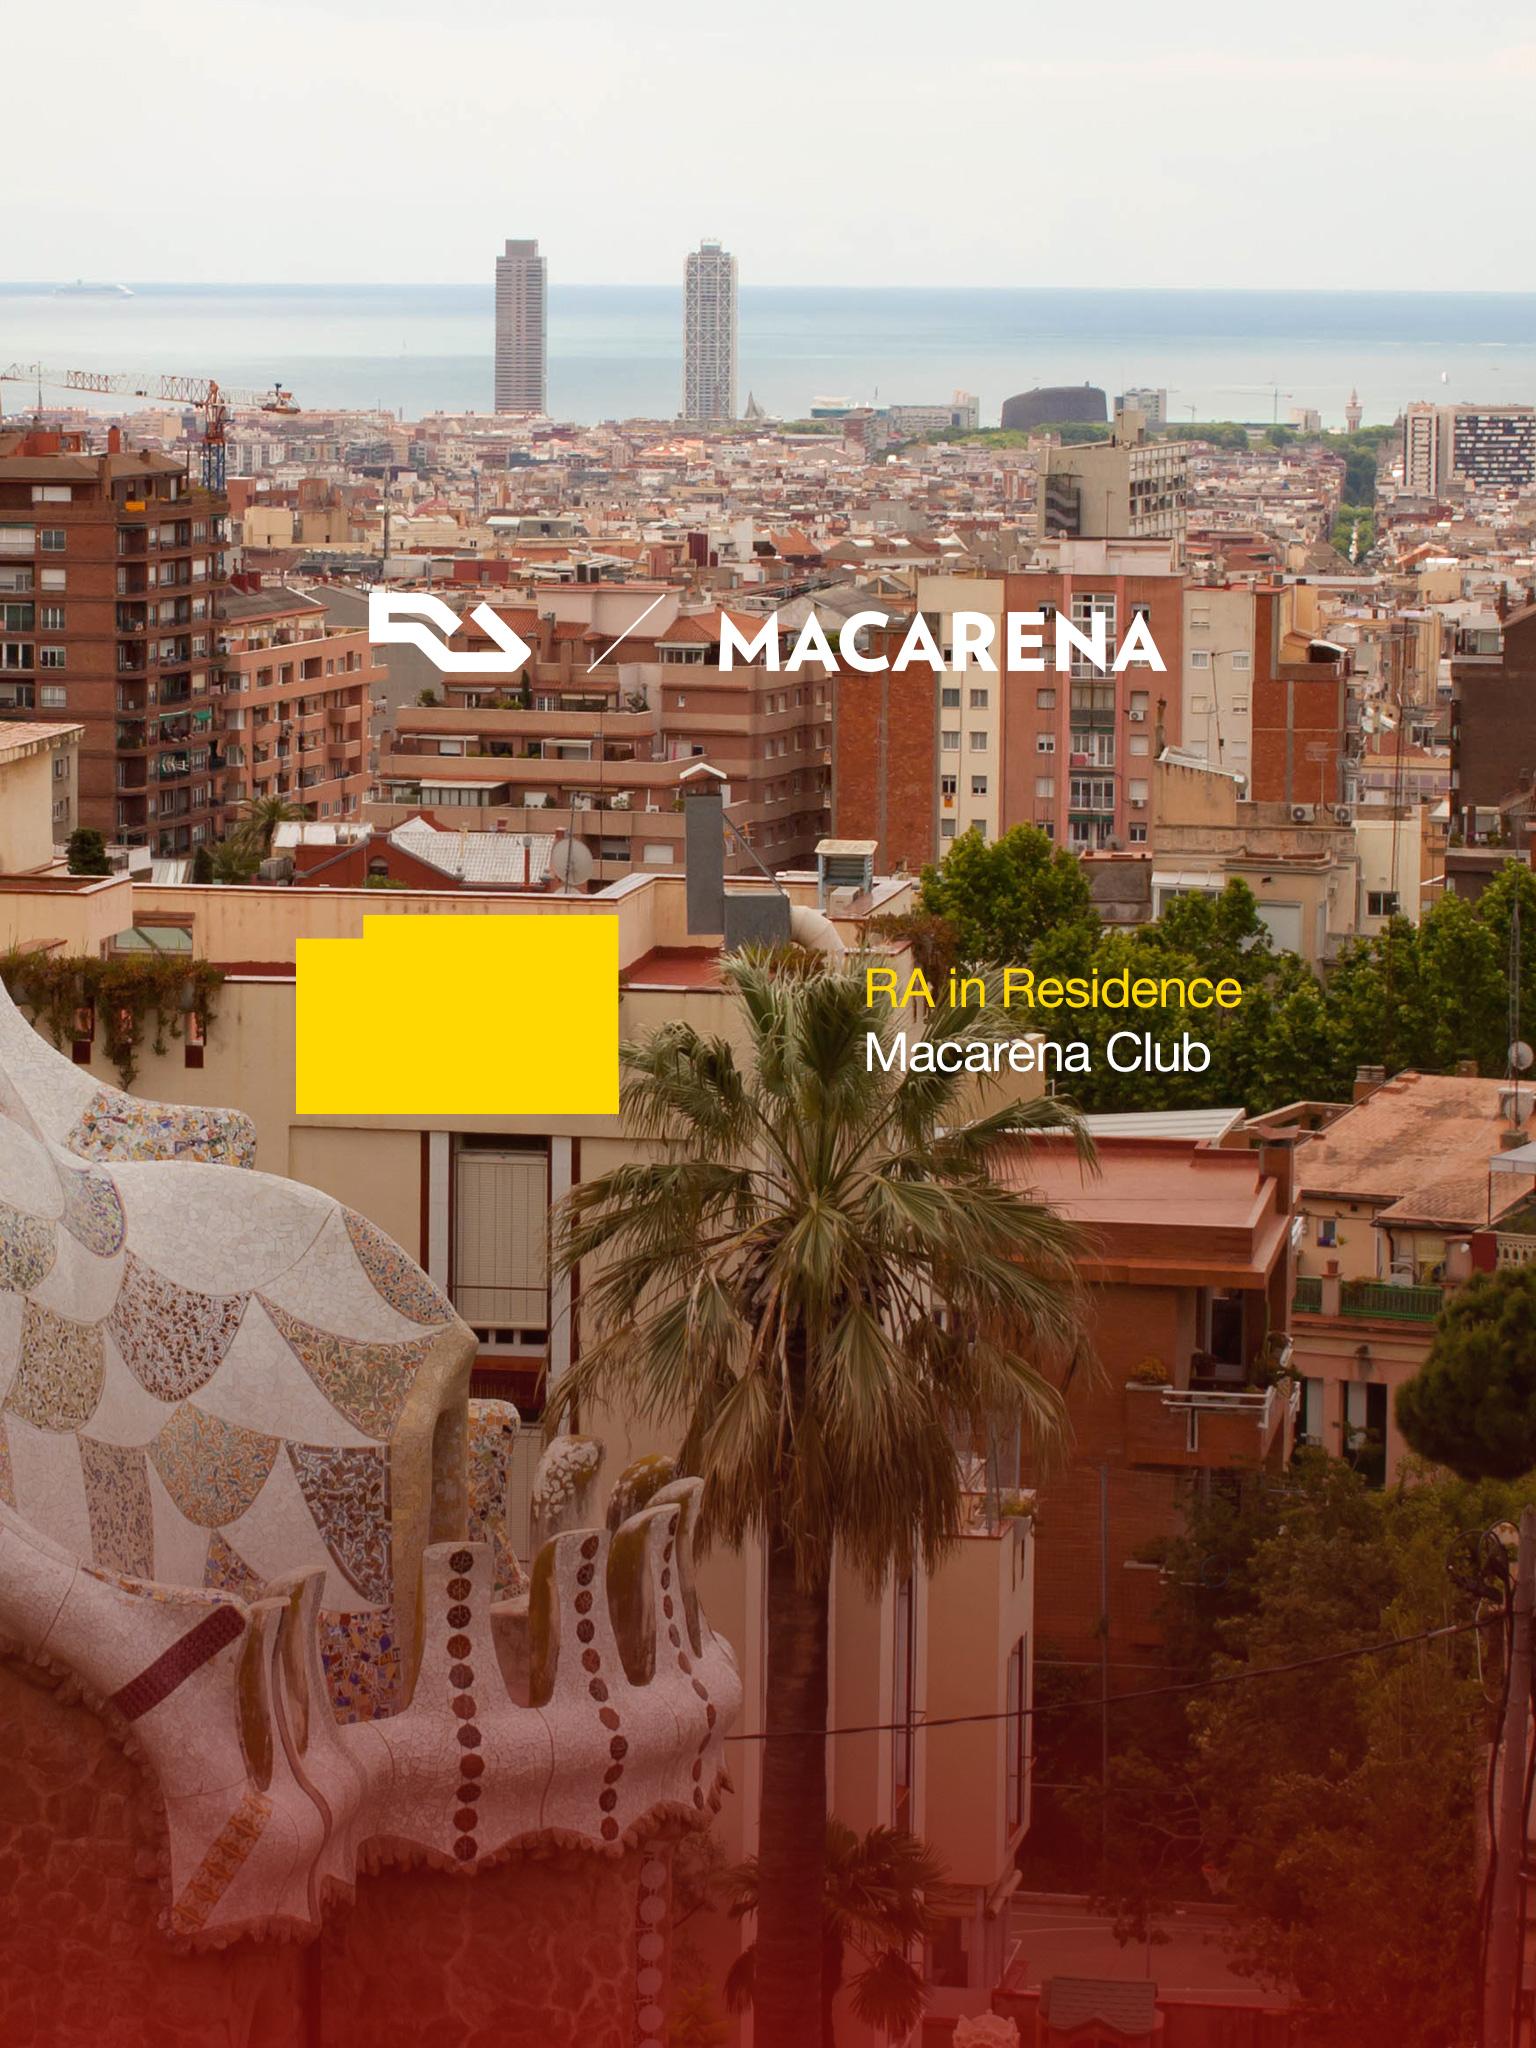 RA In Residence: Macarena Club